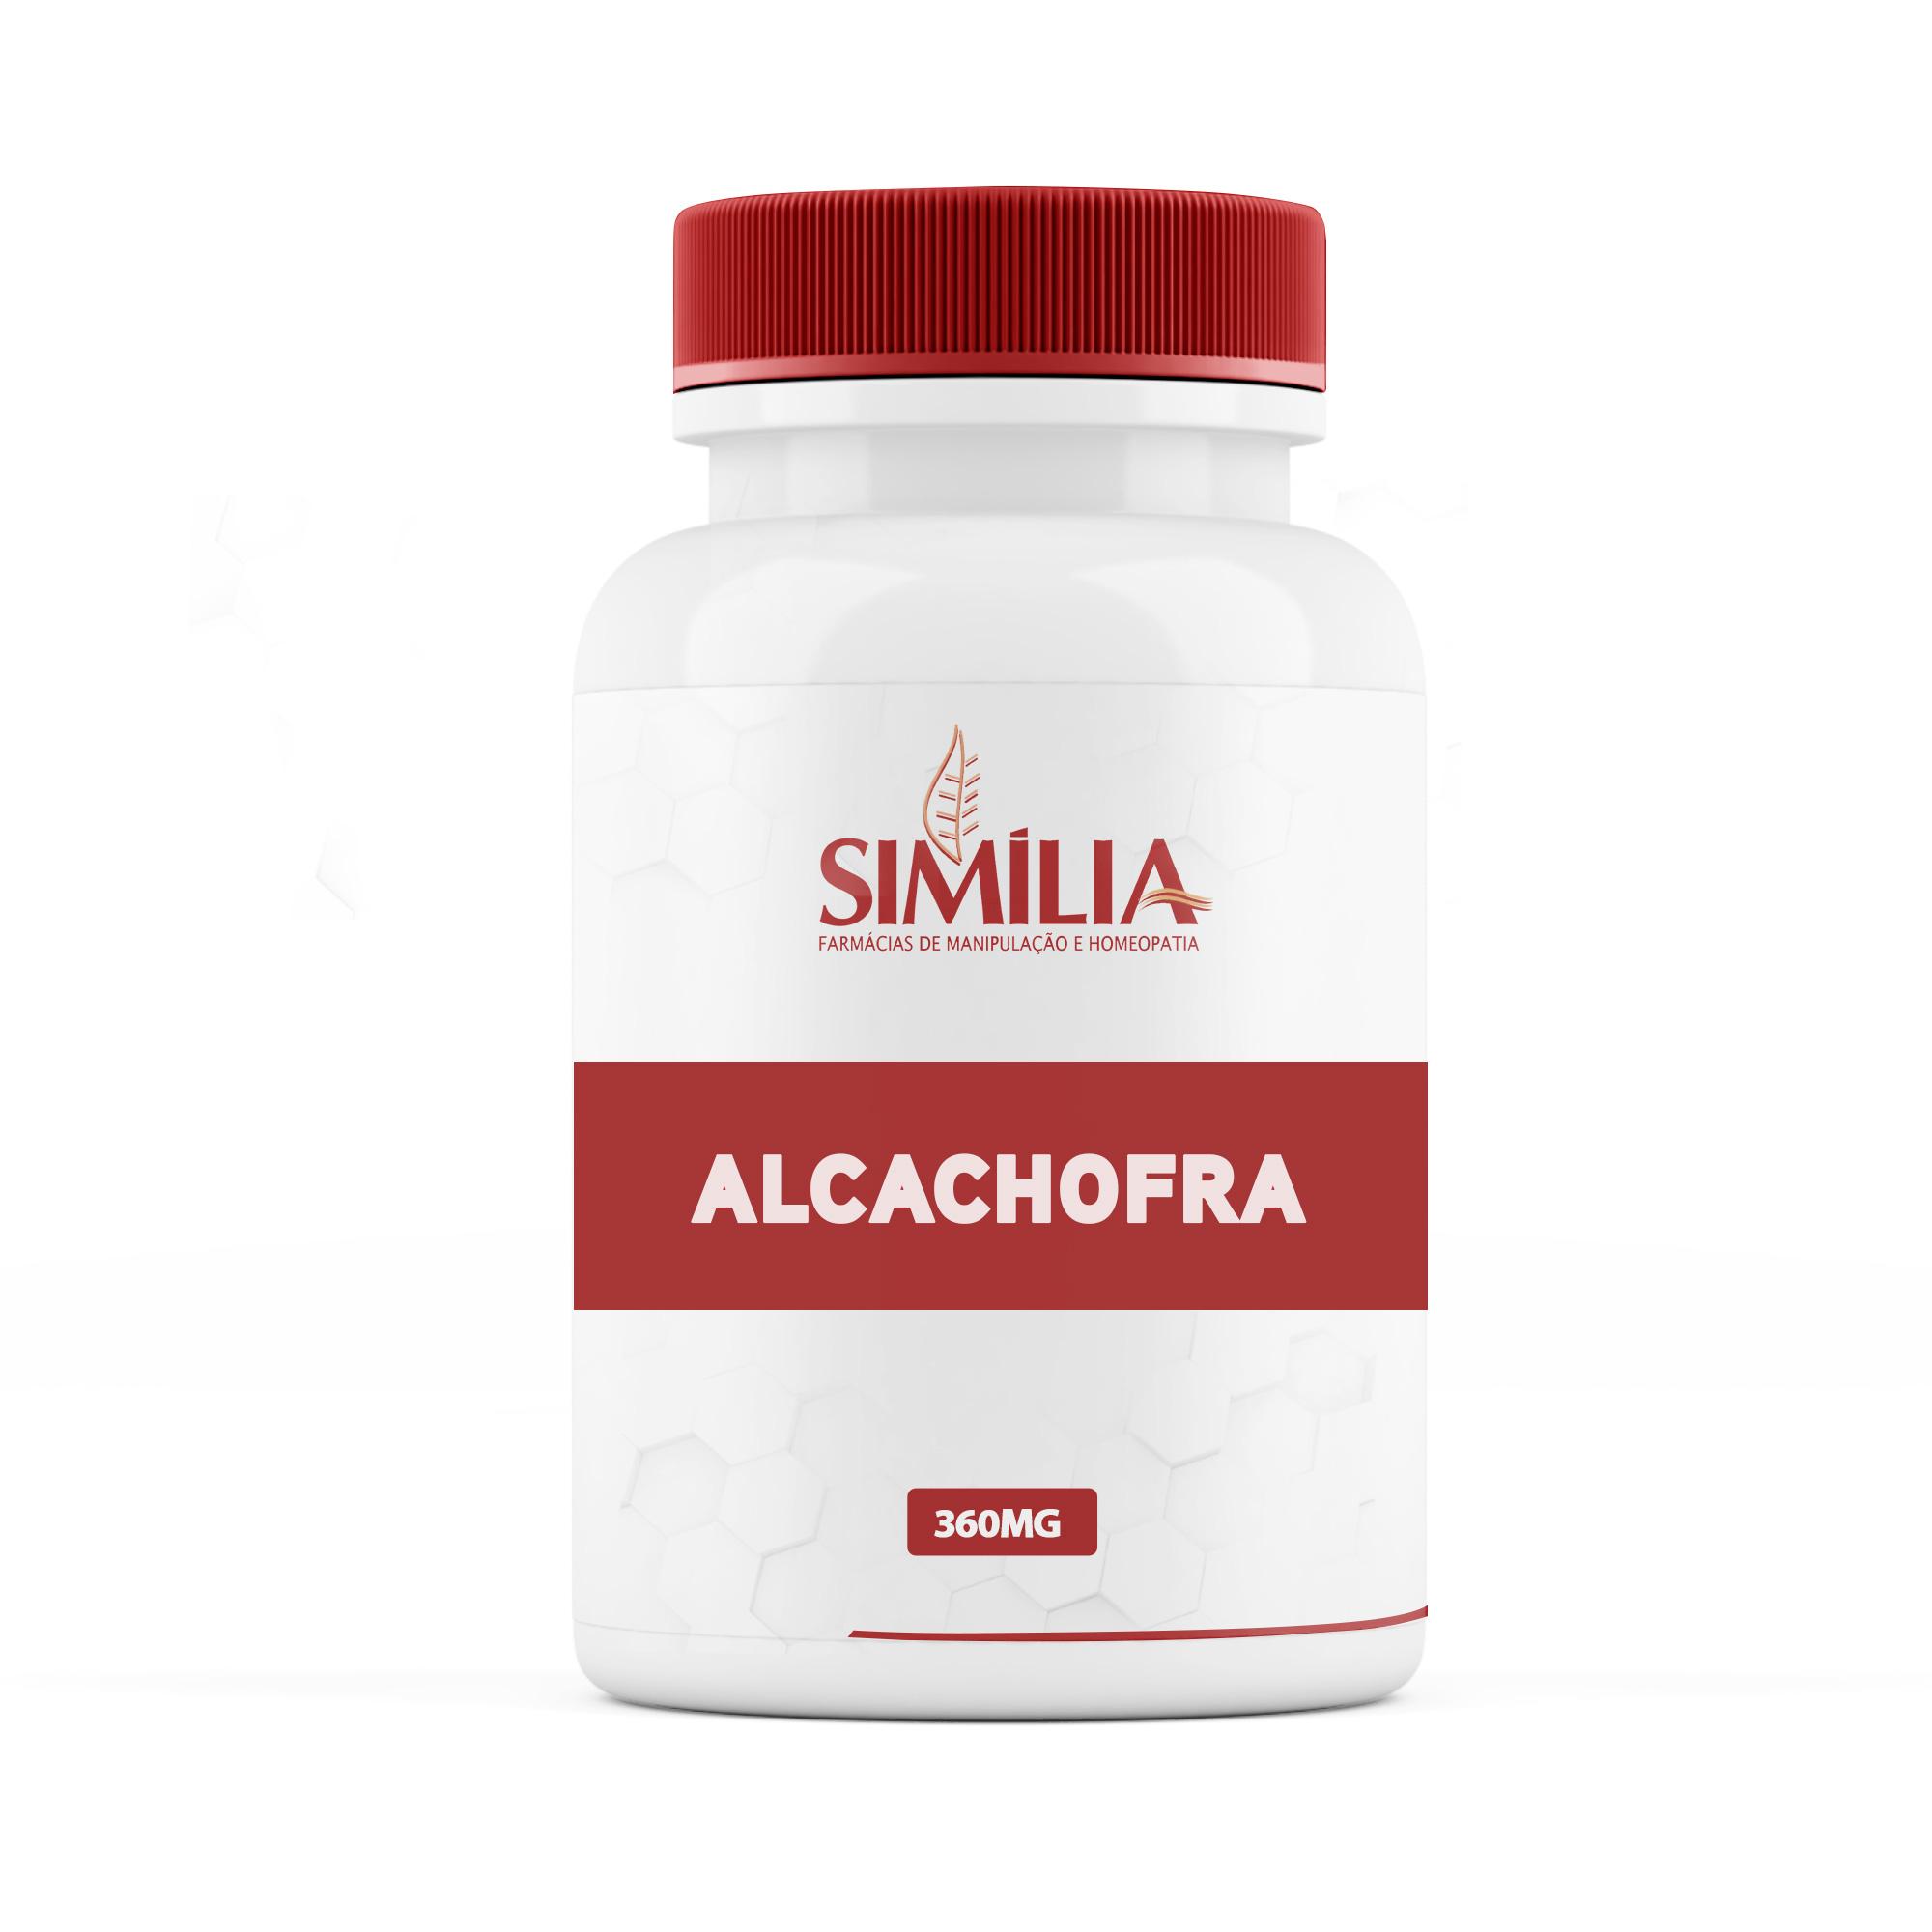 Alcachofra 360mg - Extrato Seco Padronizado - 5% Cinarina - cápsulas